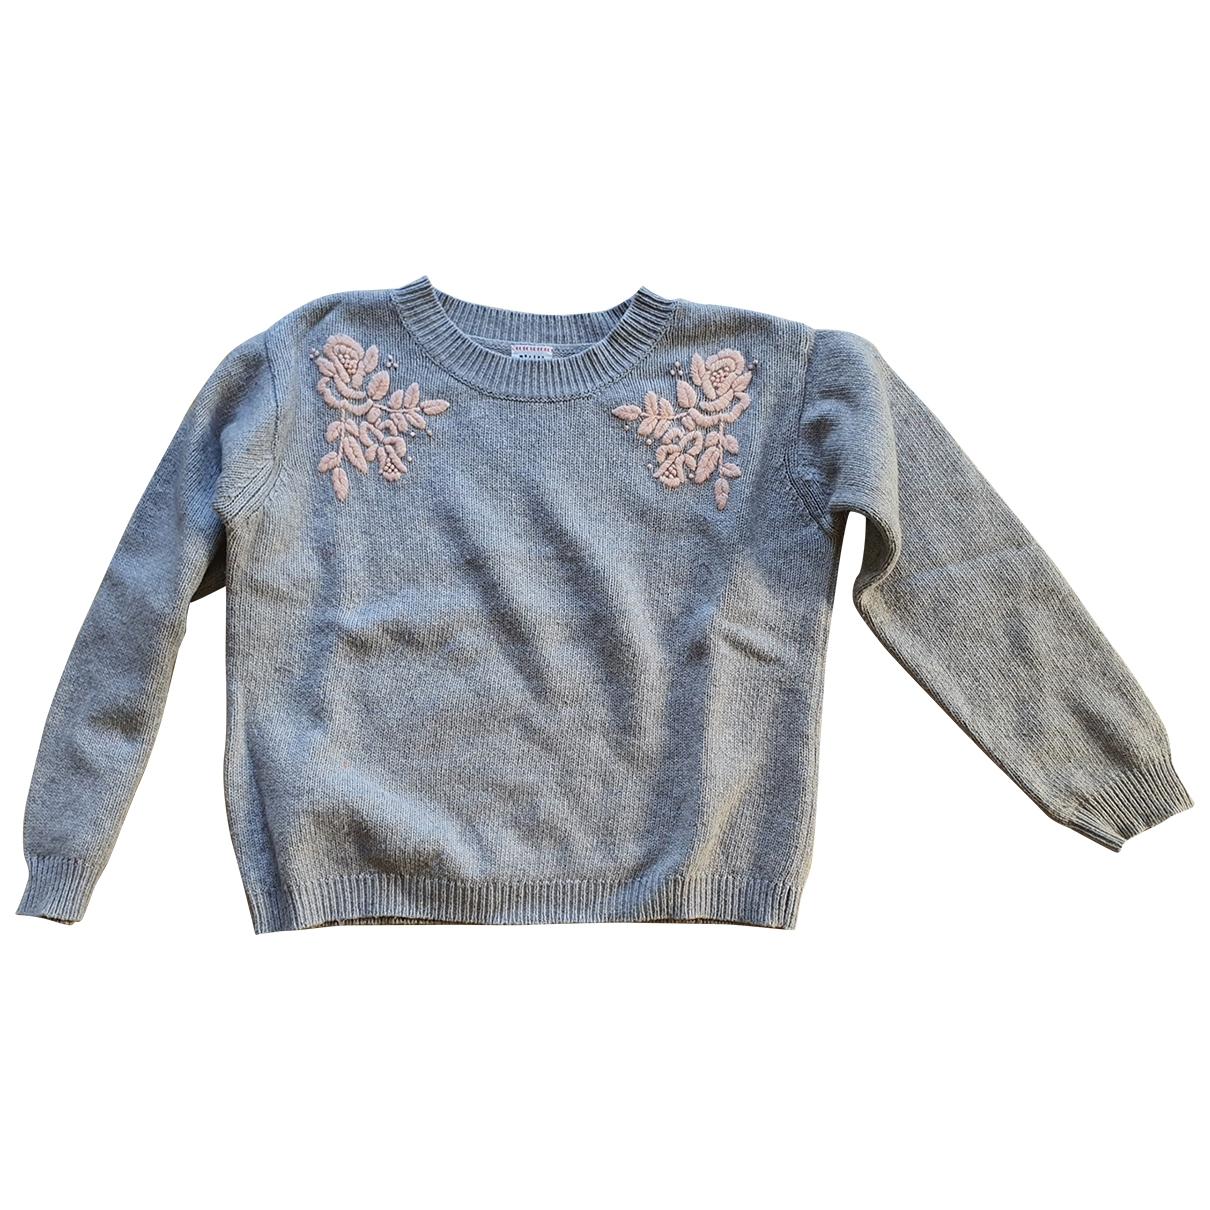 Morley - Pull   pour enfant - gris